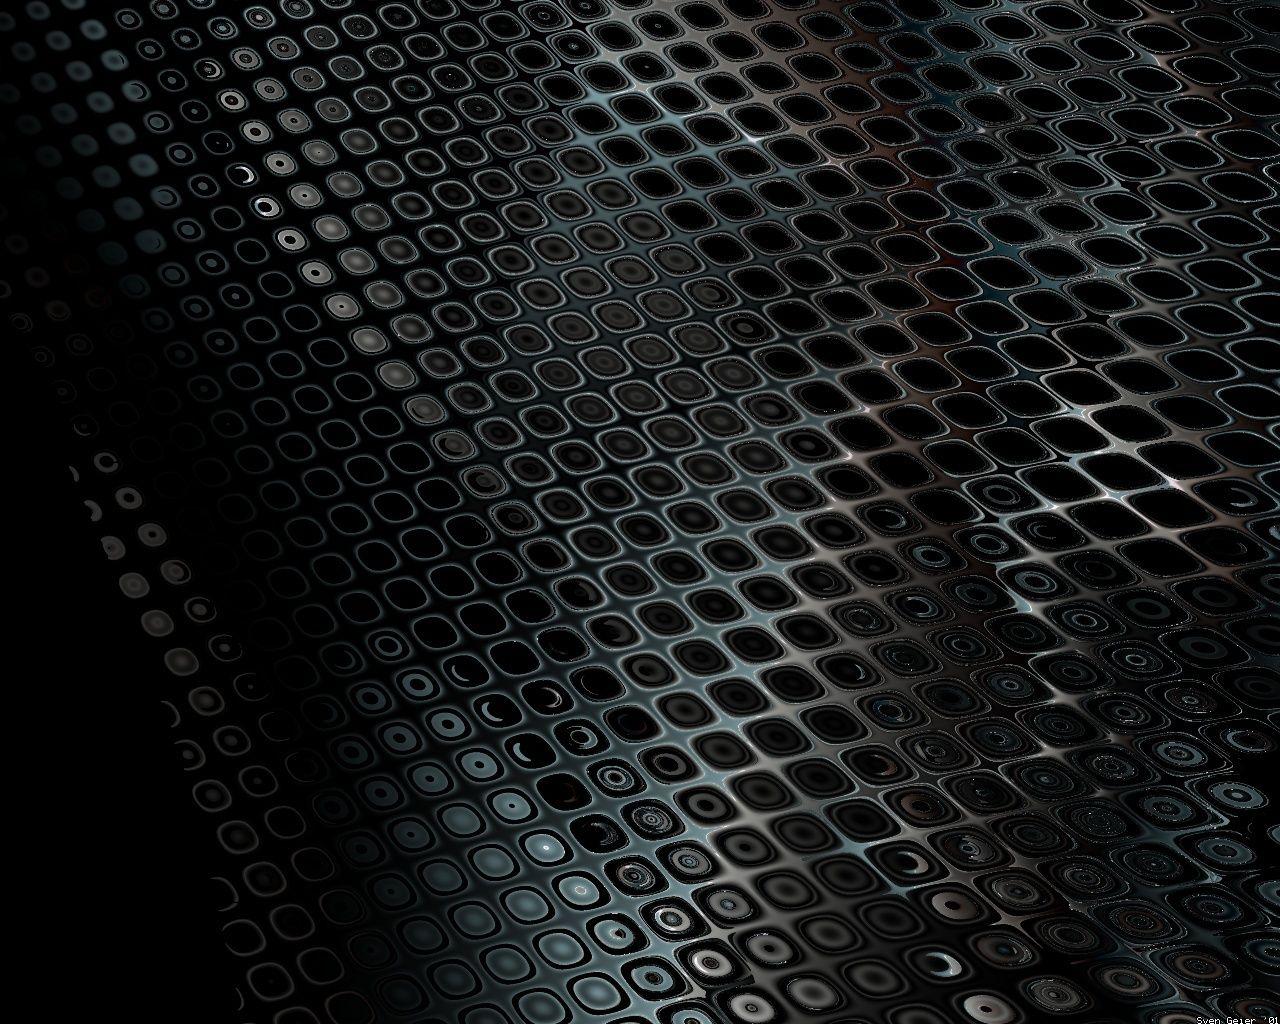 PC wallpaper wallpaper Dark Mesh 1280x1024